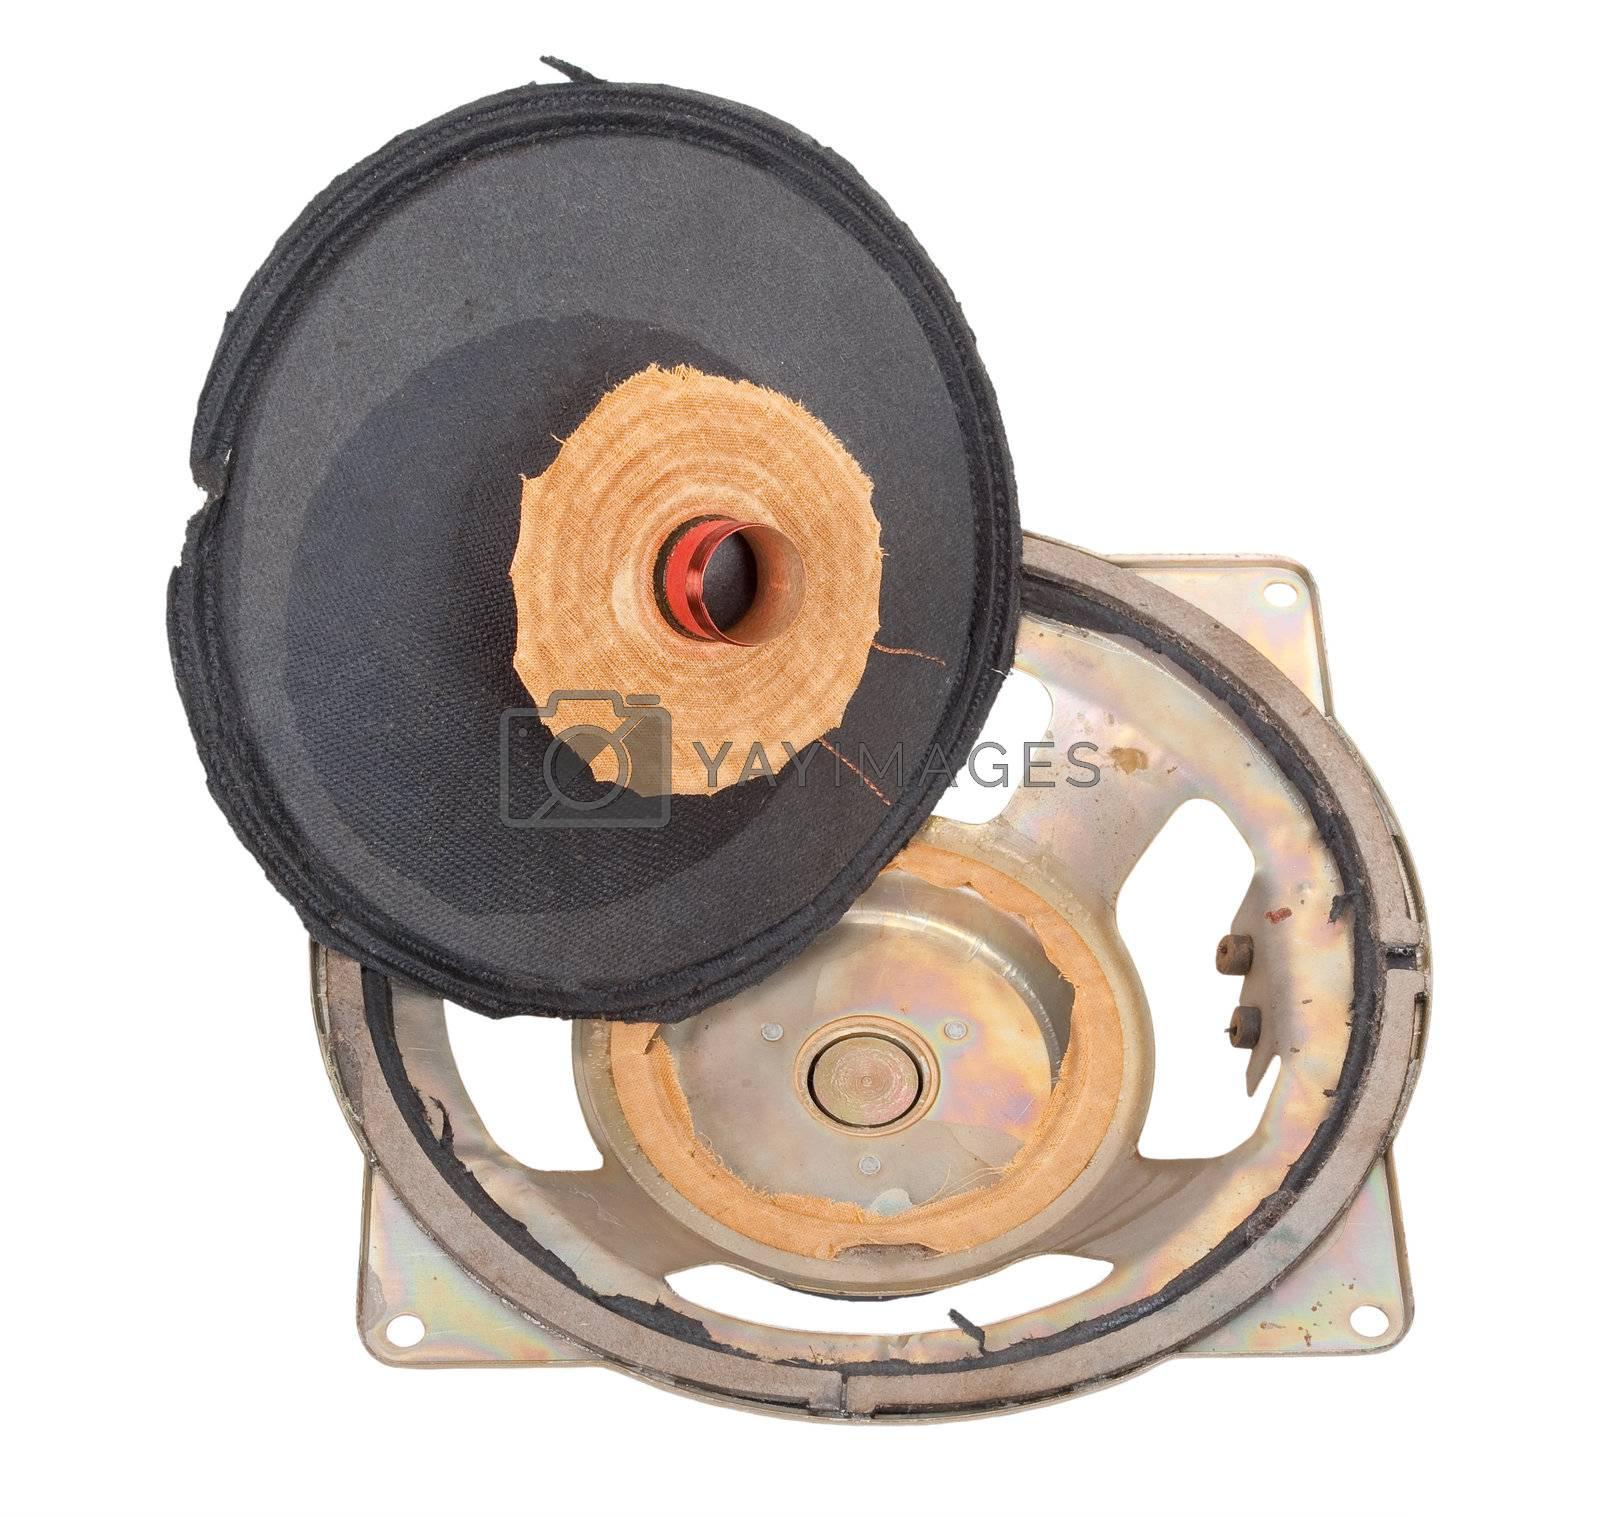 Old broken speaker